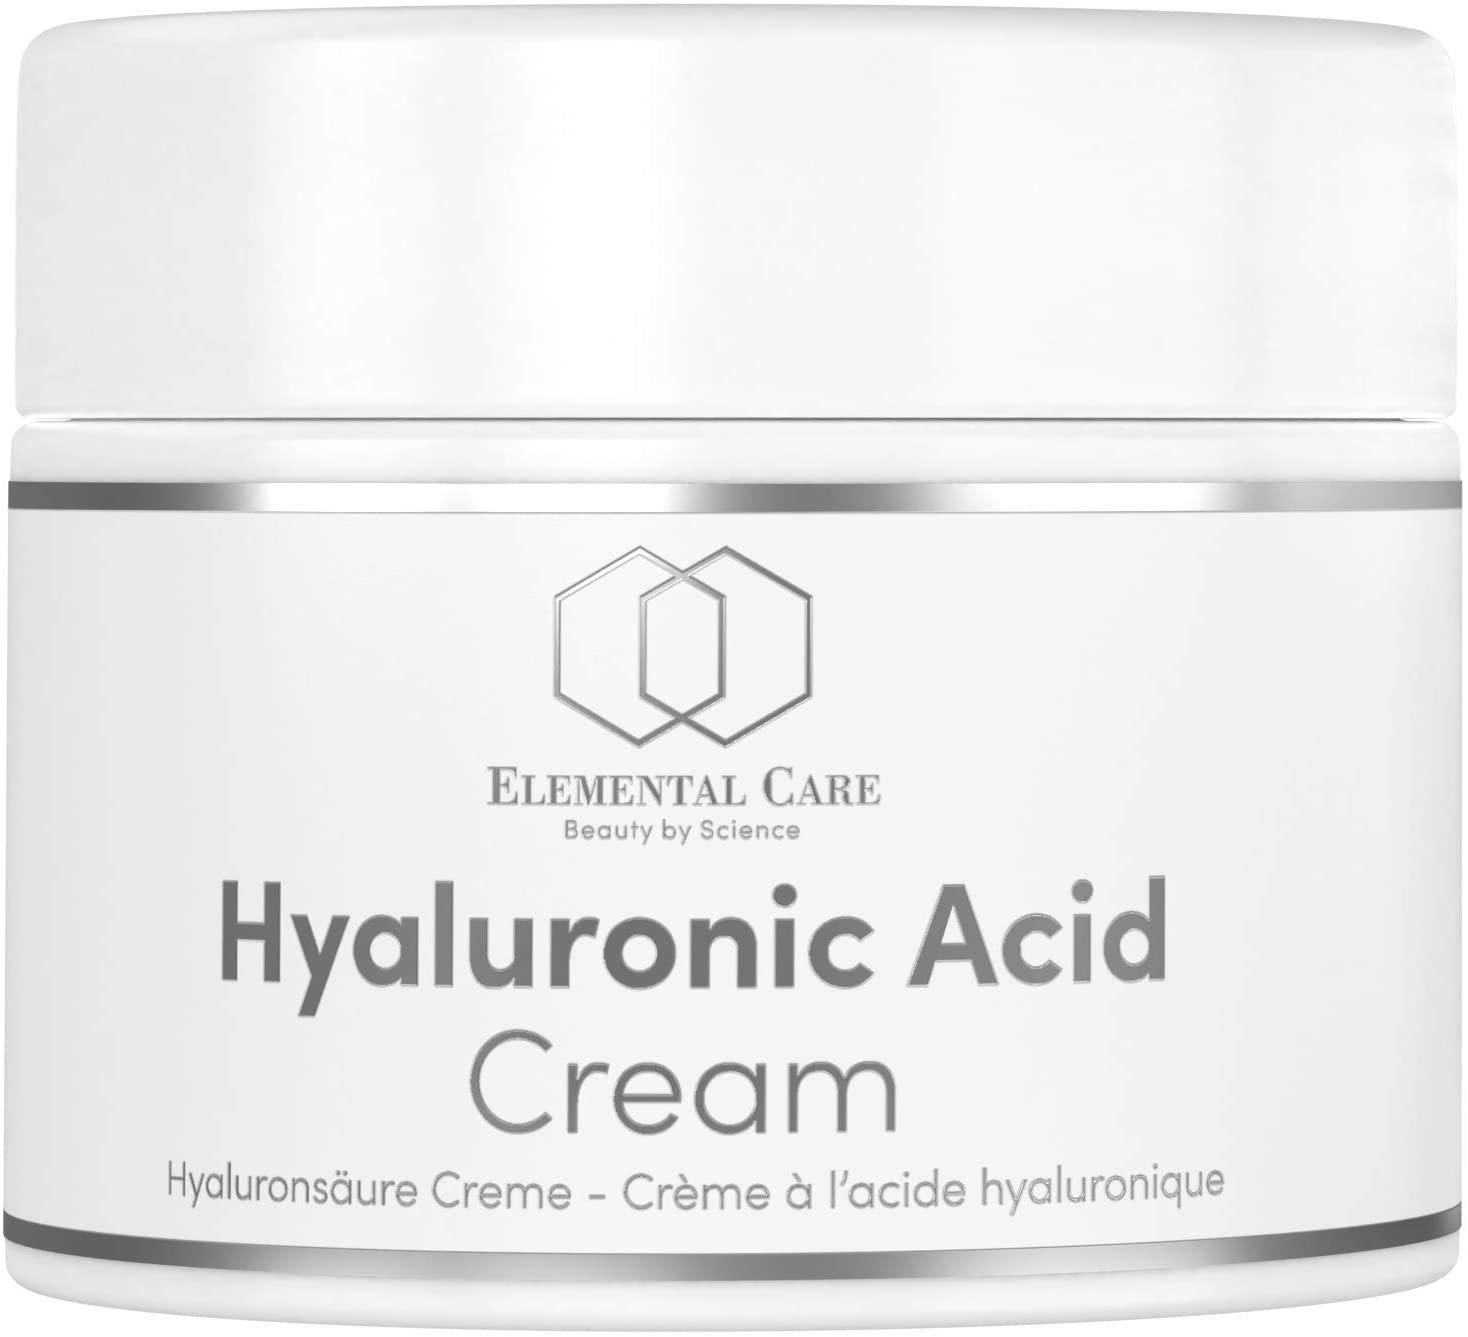 Crema facial con ácido hialurónico vegano de Elemental Care